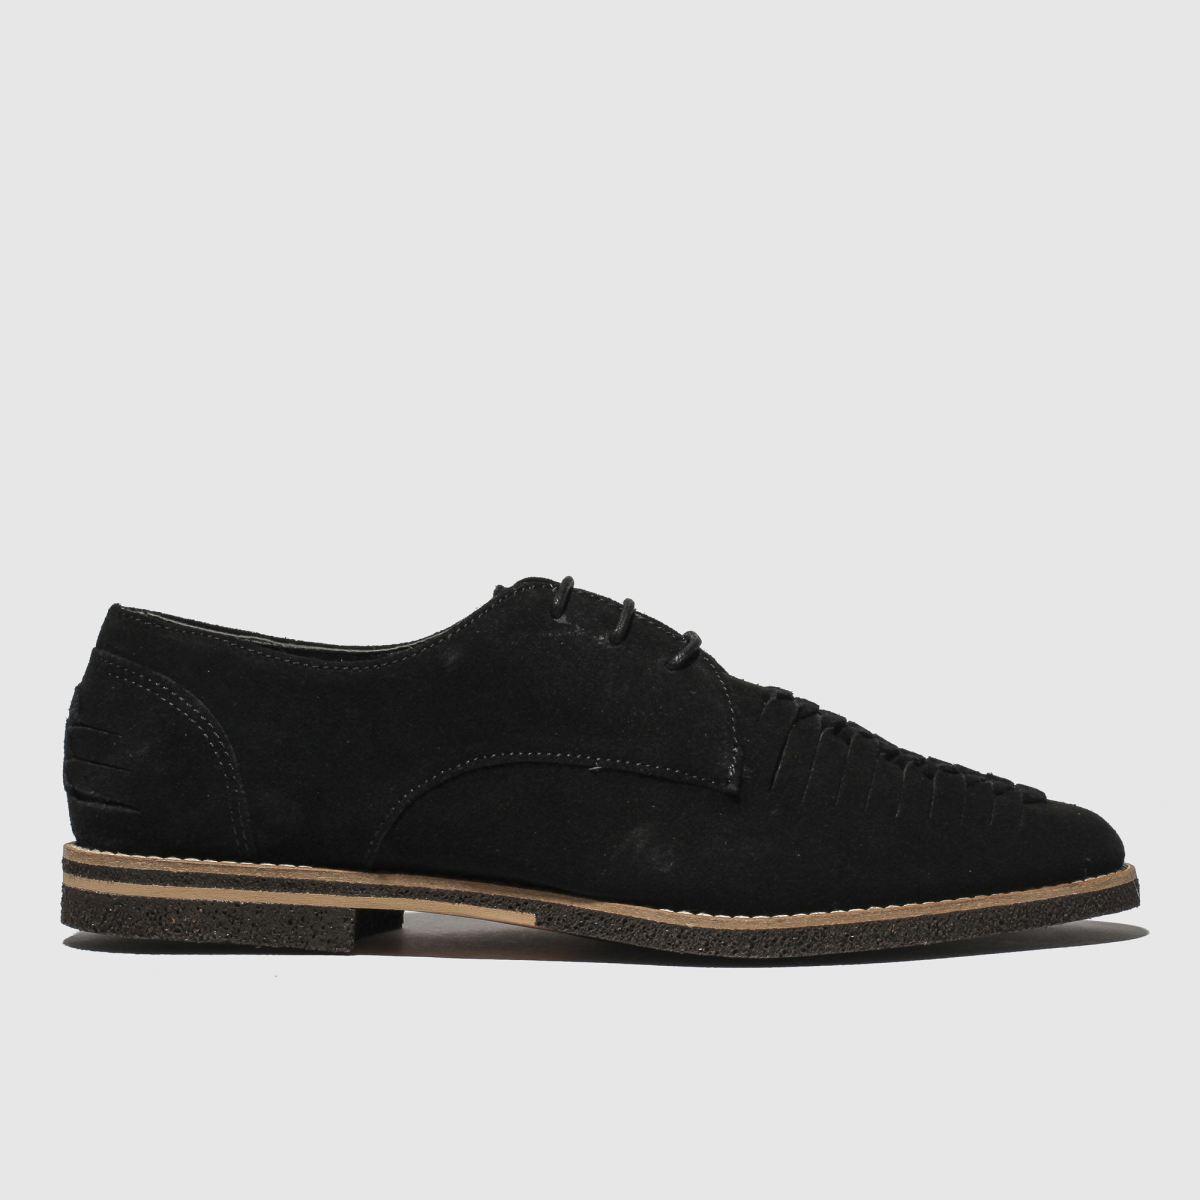 H by Hudson H By Hudson Black Chatra Shoes